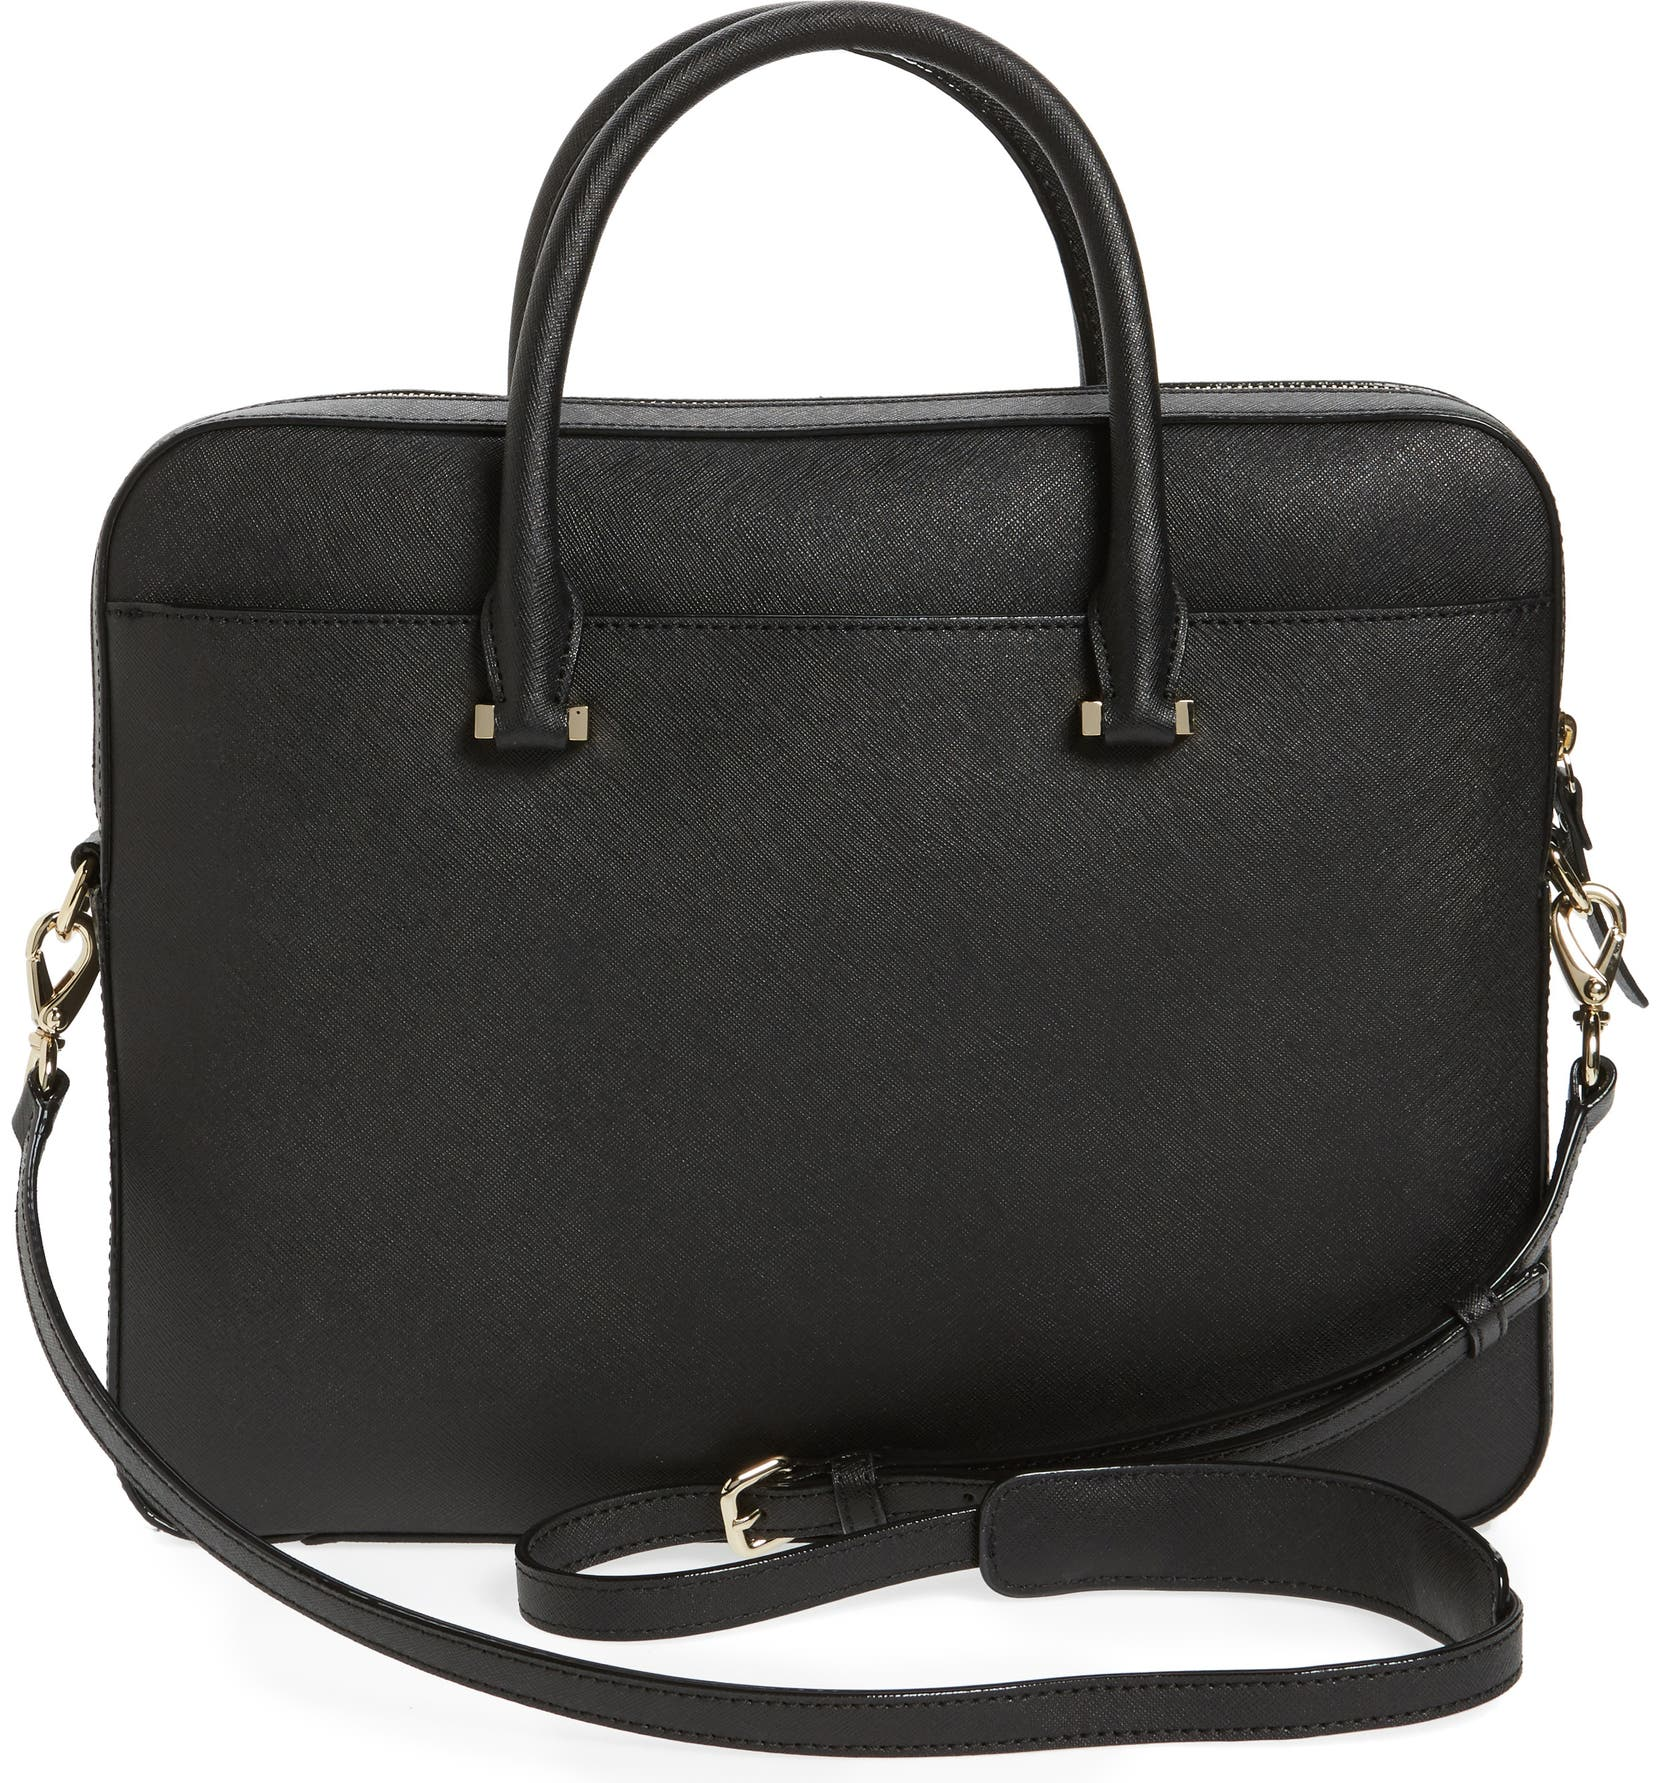 online retailer 99dff 499b8 saffiano leather 13 inch laptop bag